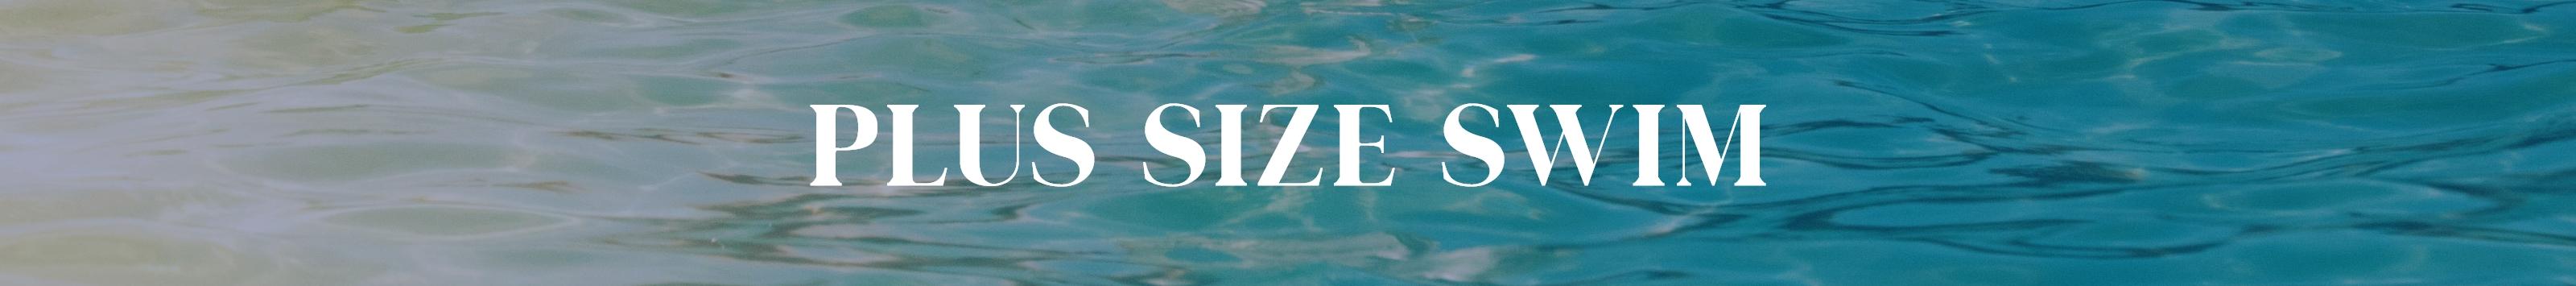 banner-category-swim-plussizeswim-1.jpg